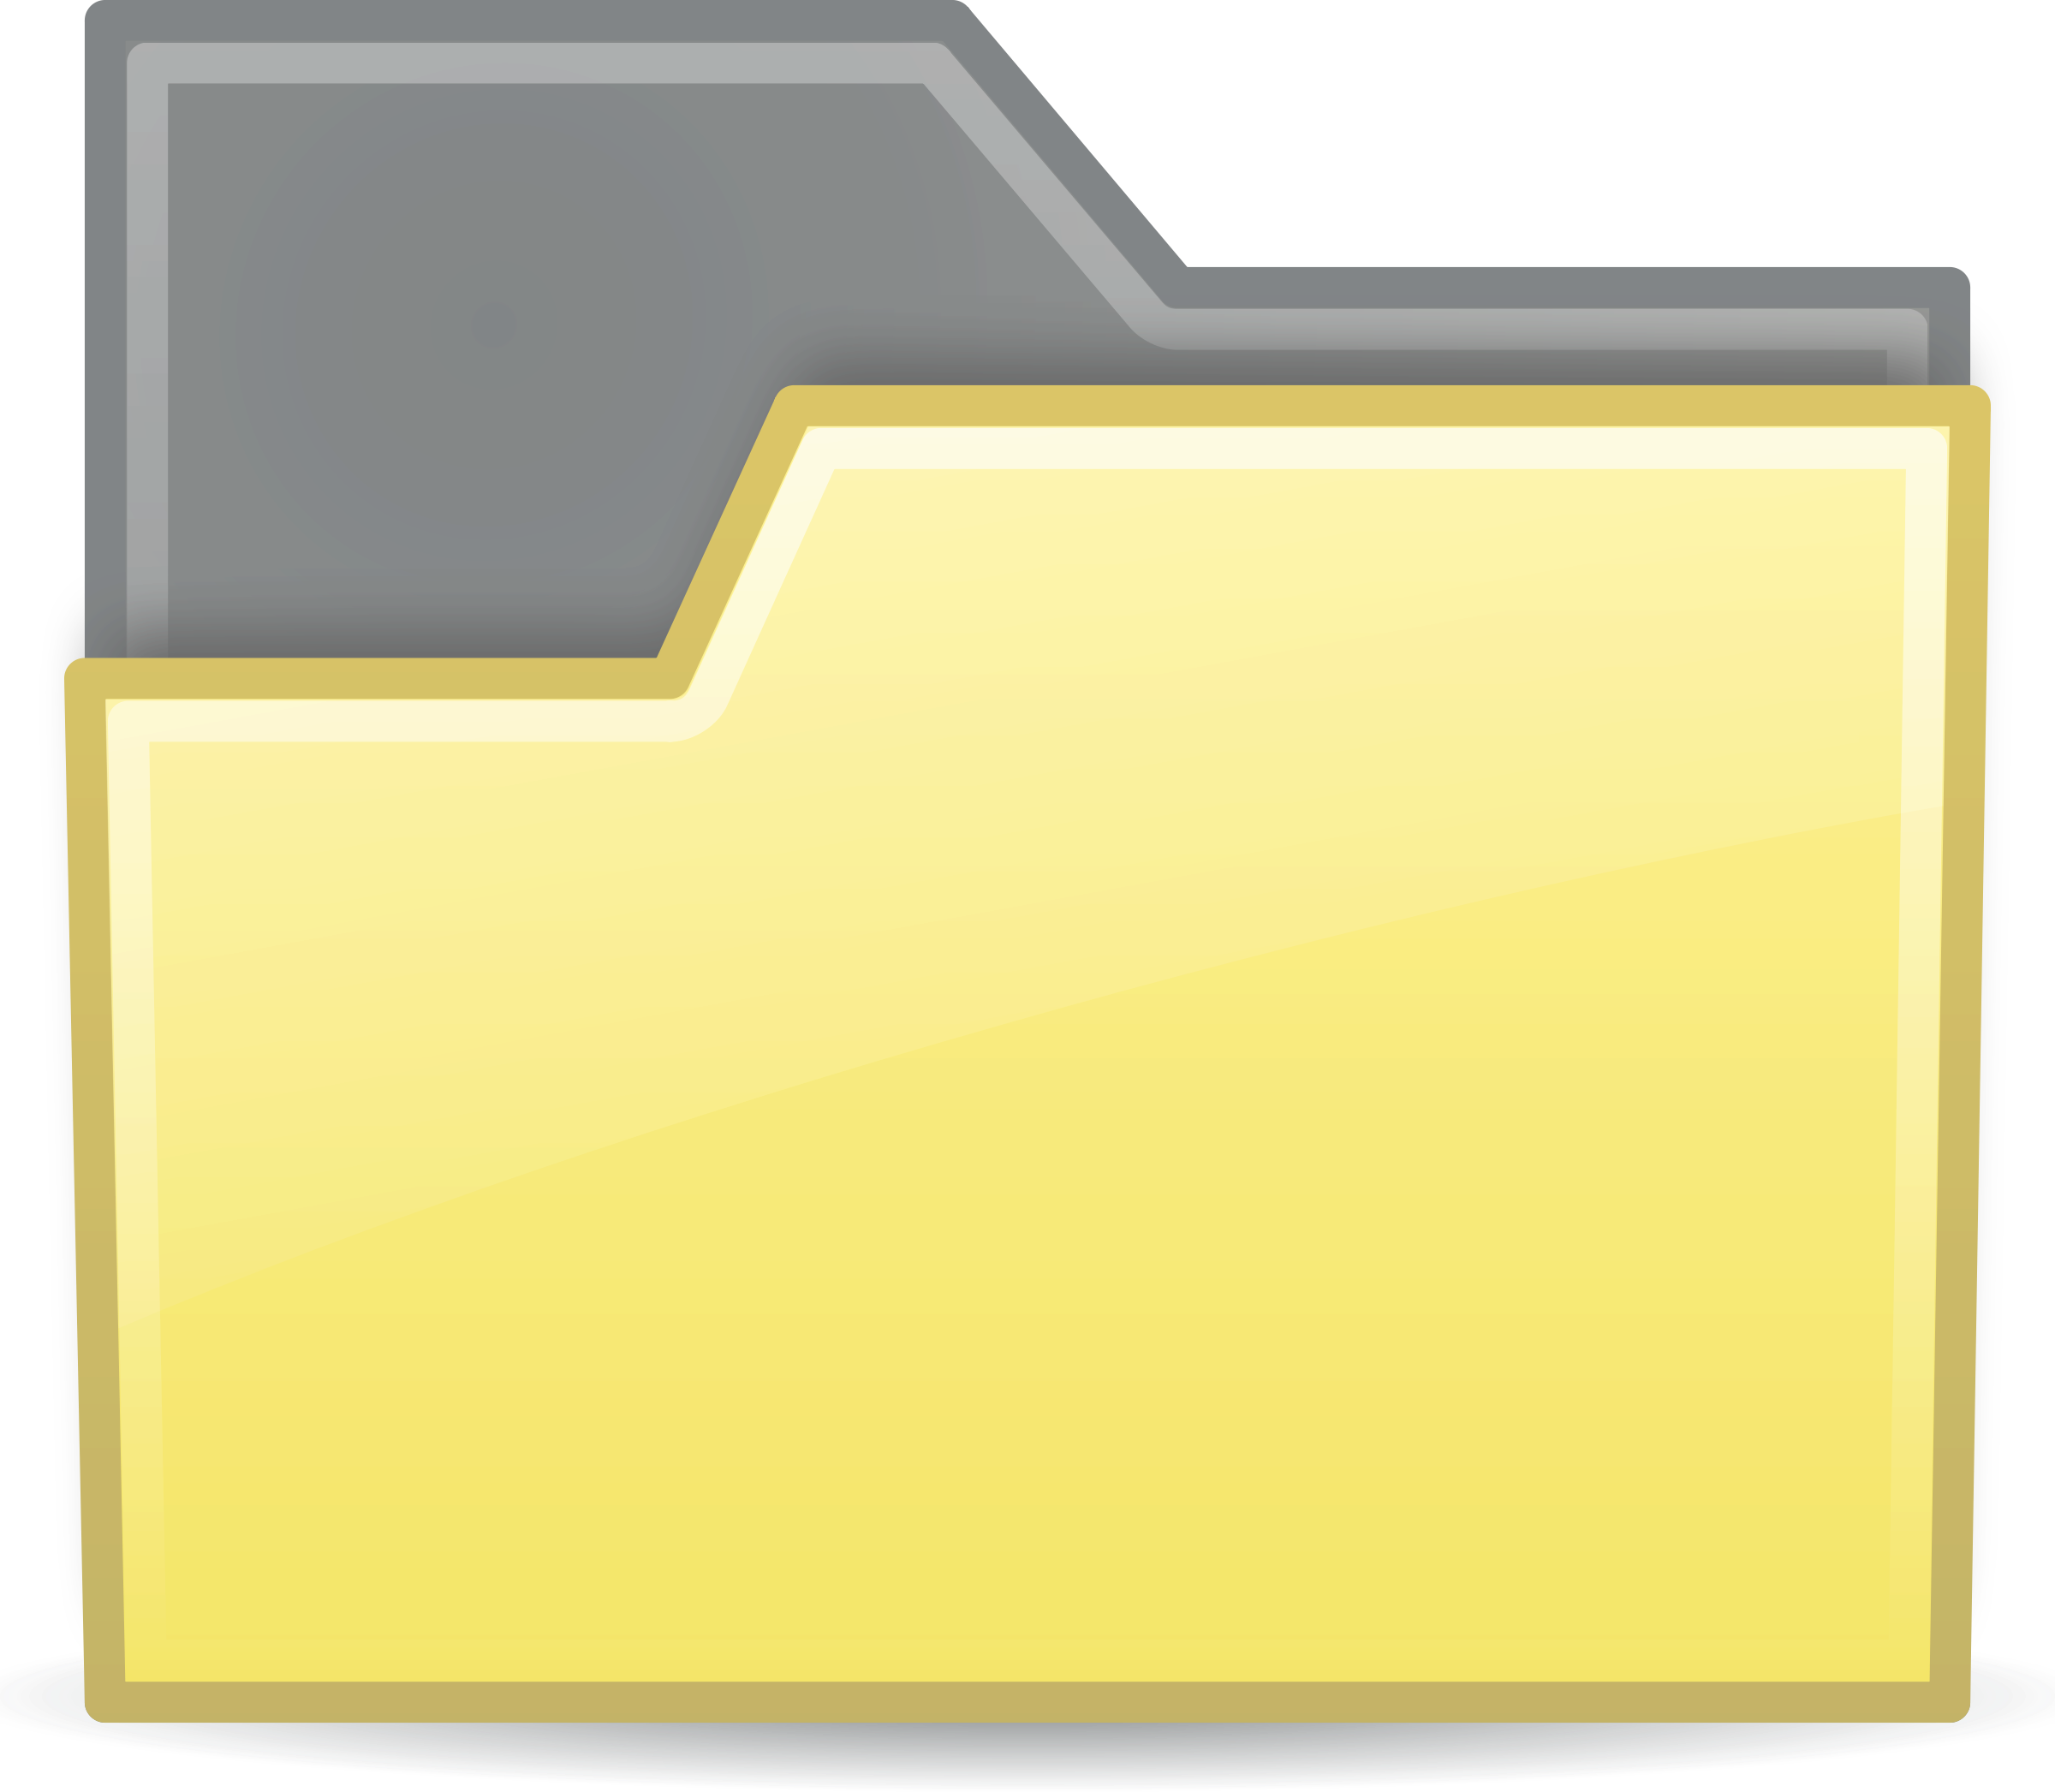 Folder clipart office material. Yellow semitransparent big image